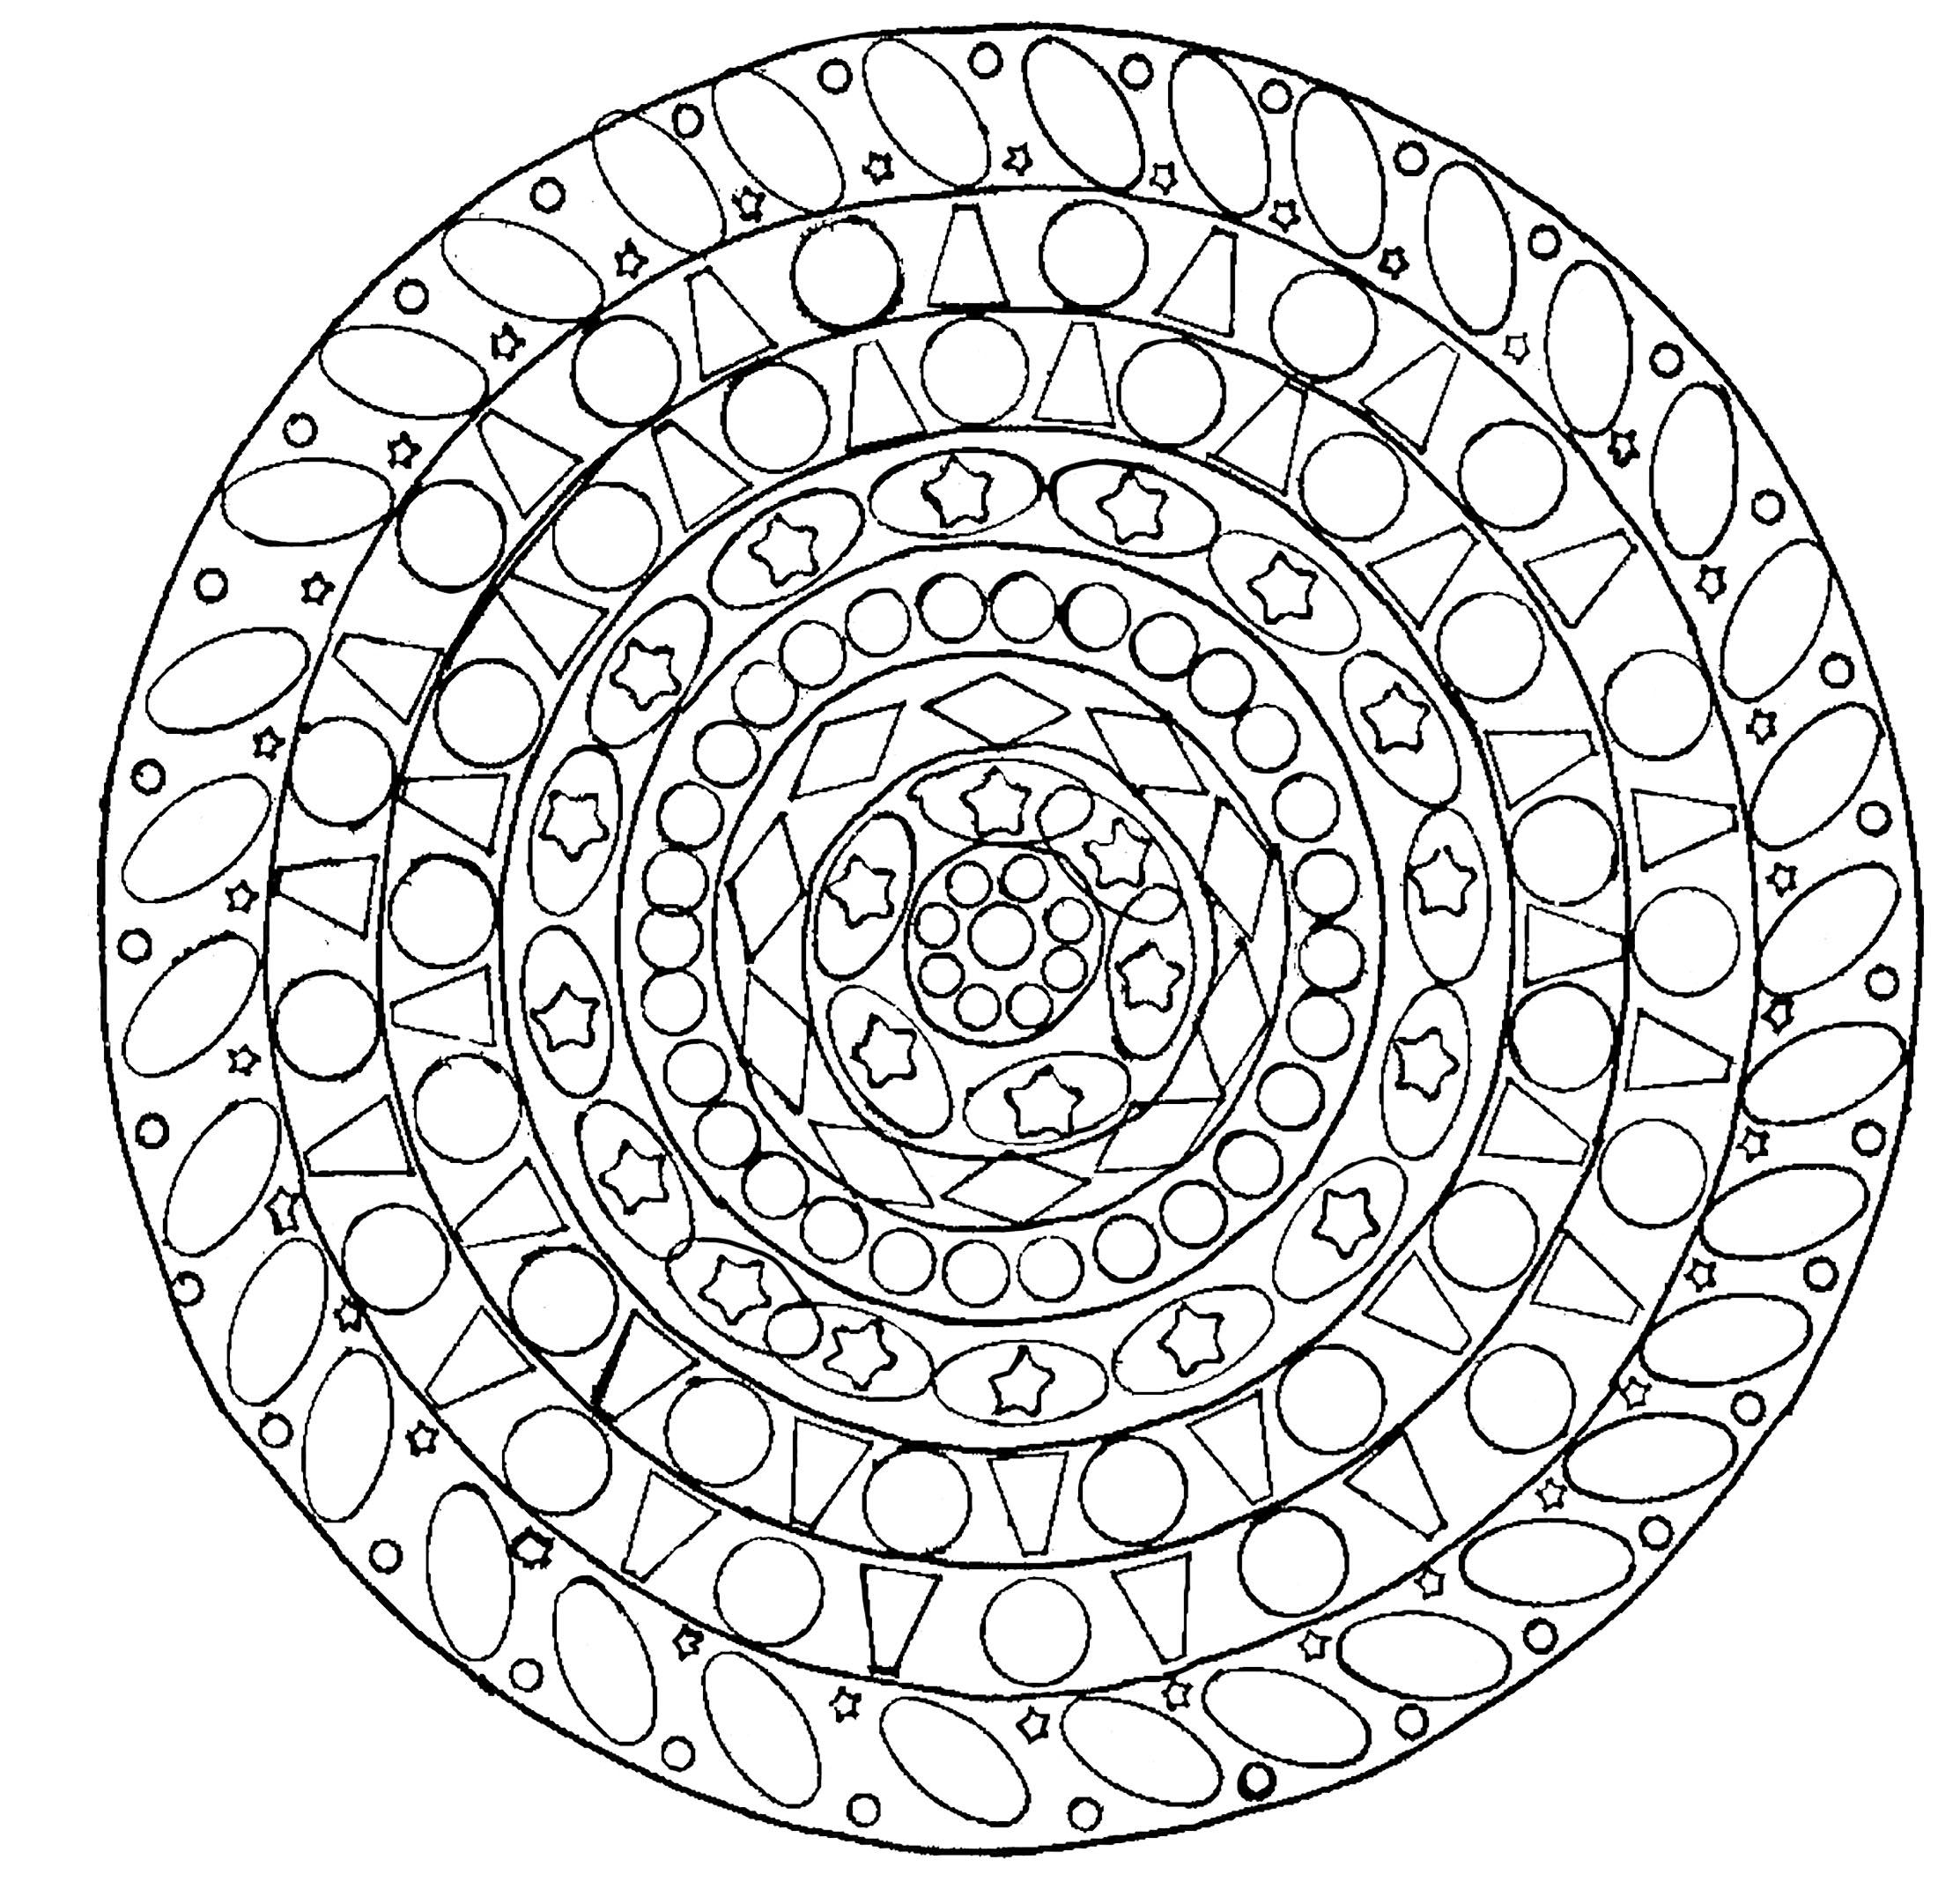 Mandala domandala 7 mandalas coloriages difficiles - Coloriages mandalas ...